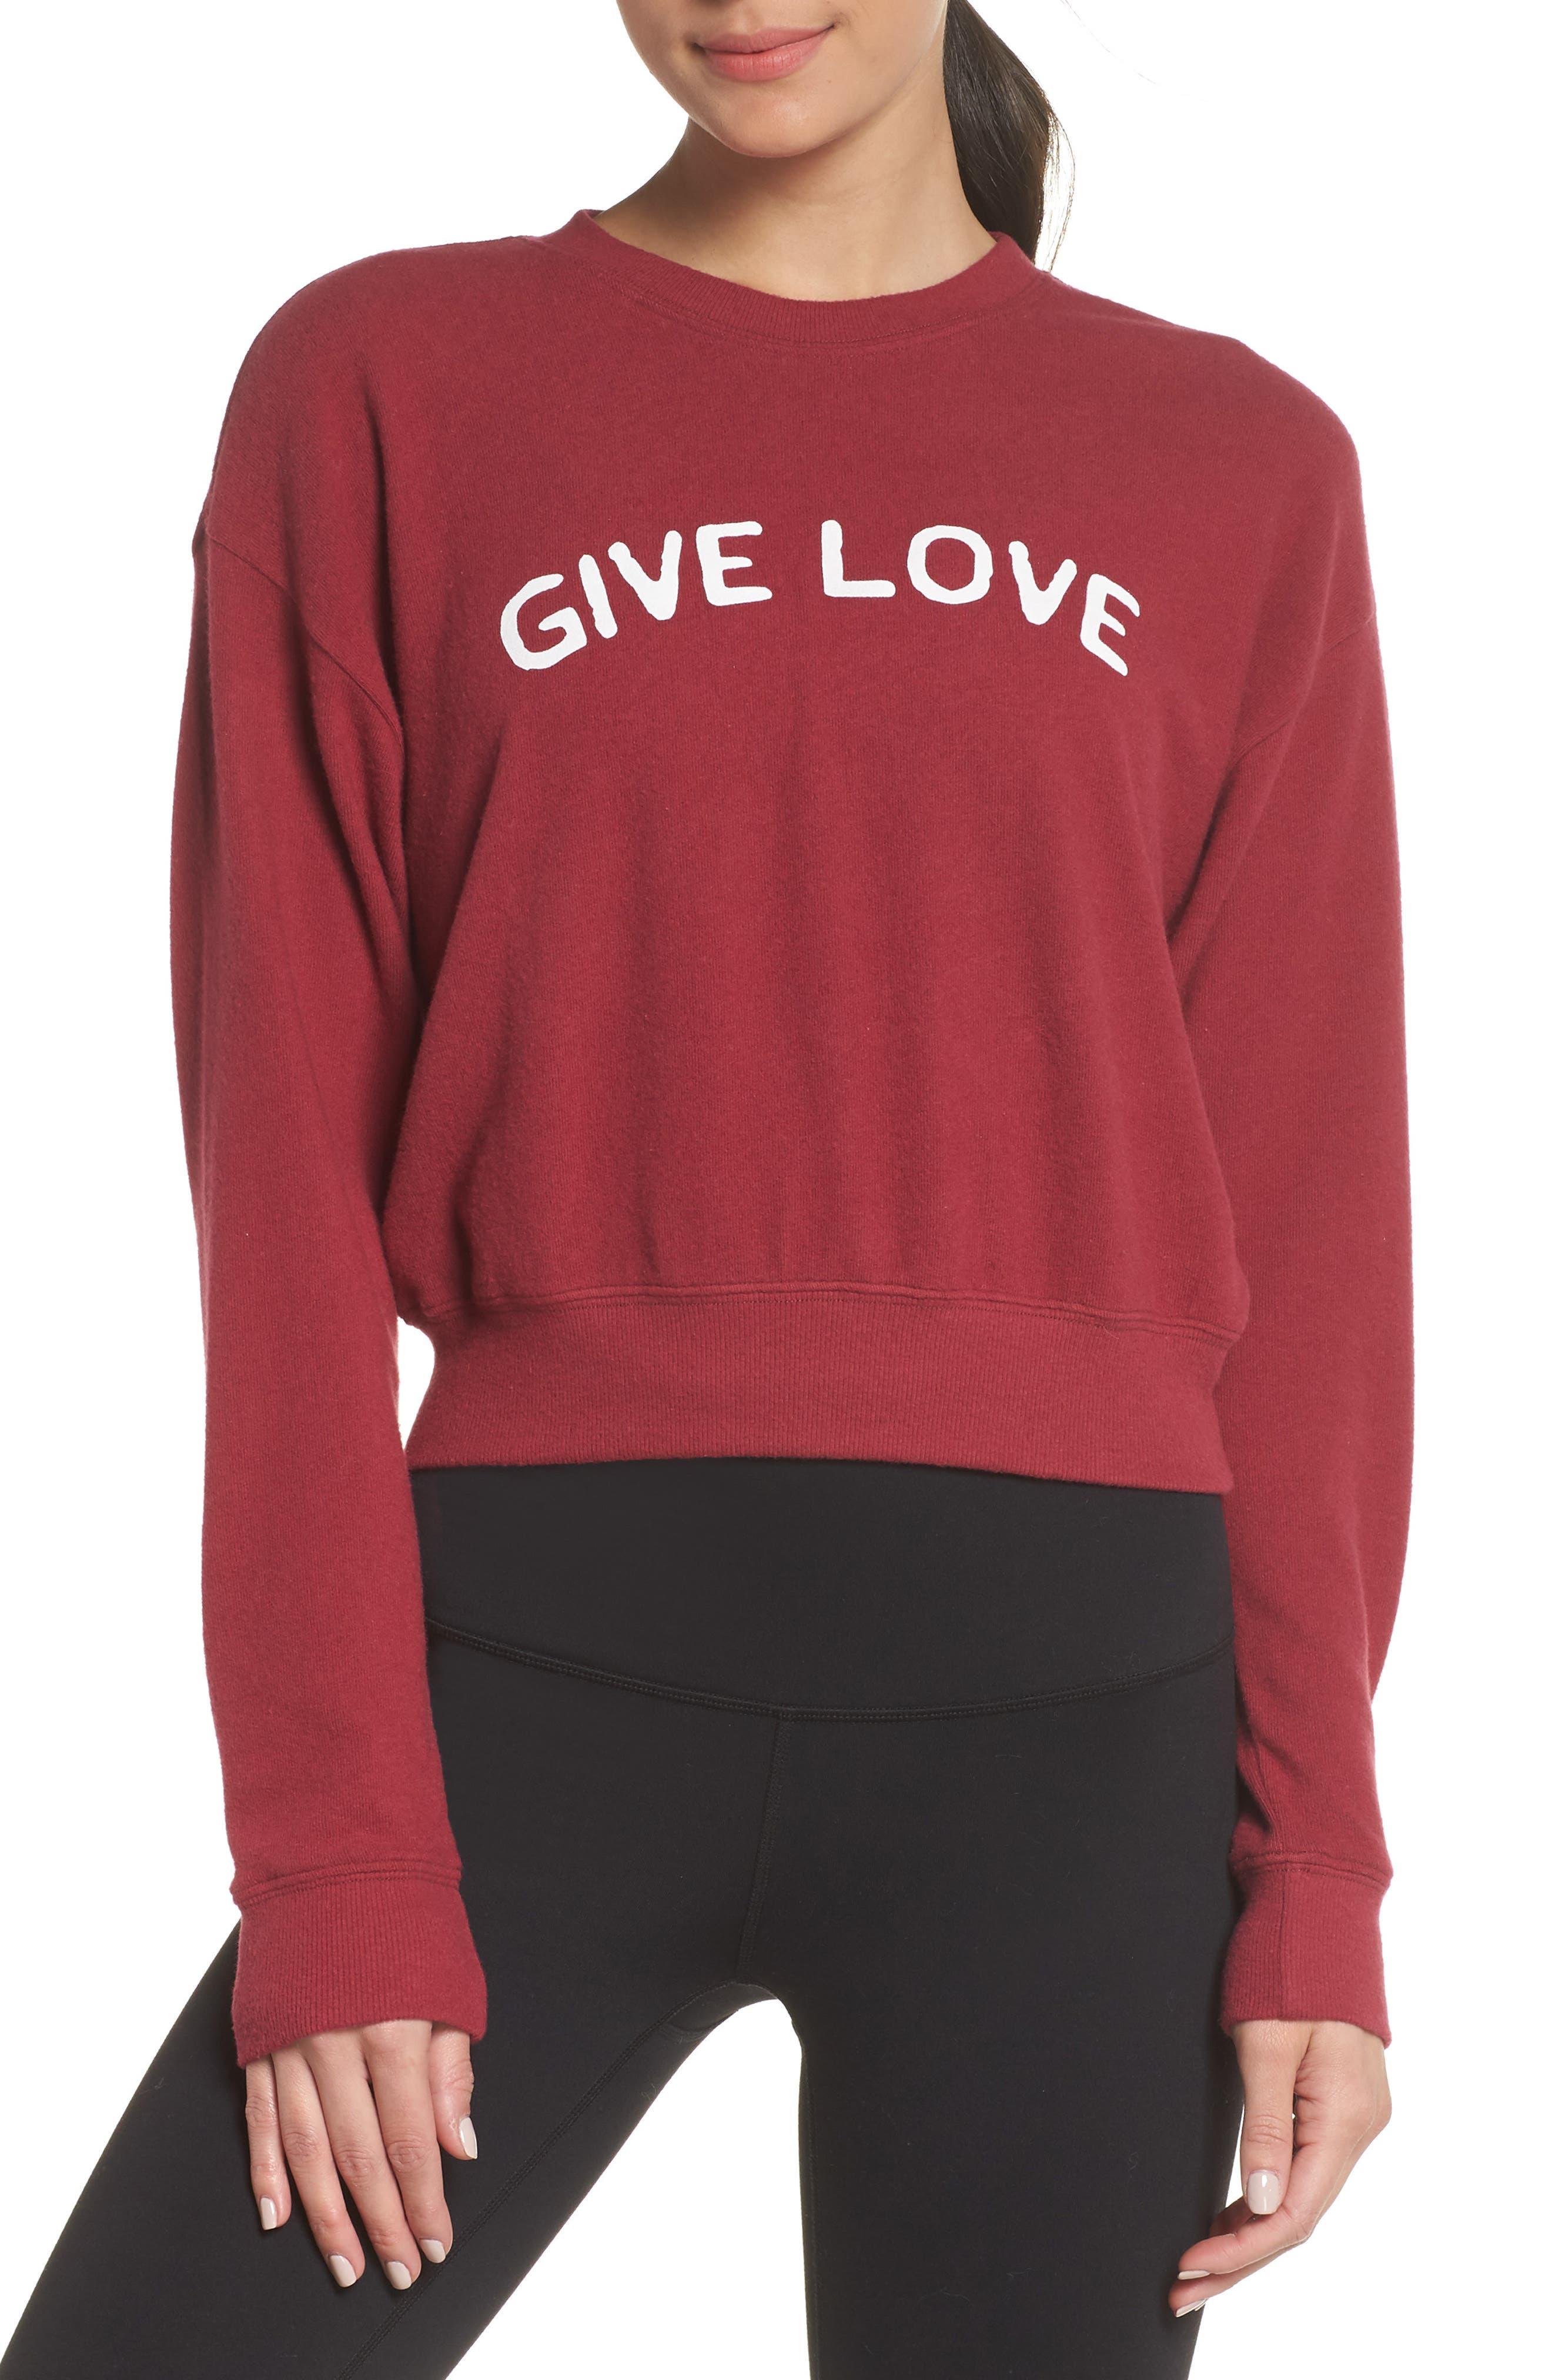 Malibu Give Love Crewneck Sweatshirt by Spiritual Gangster